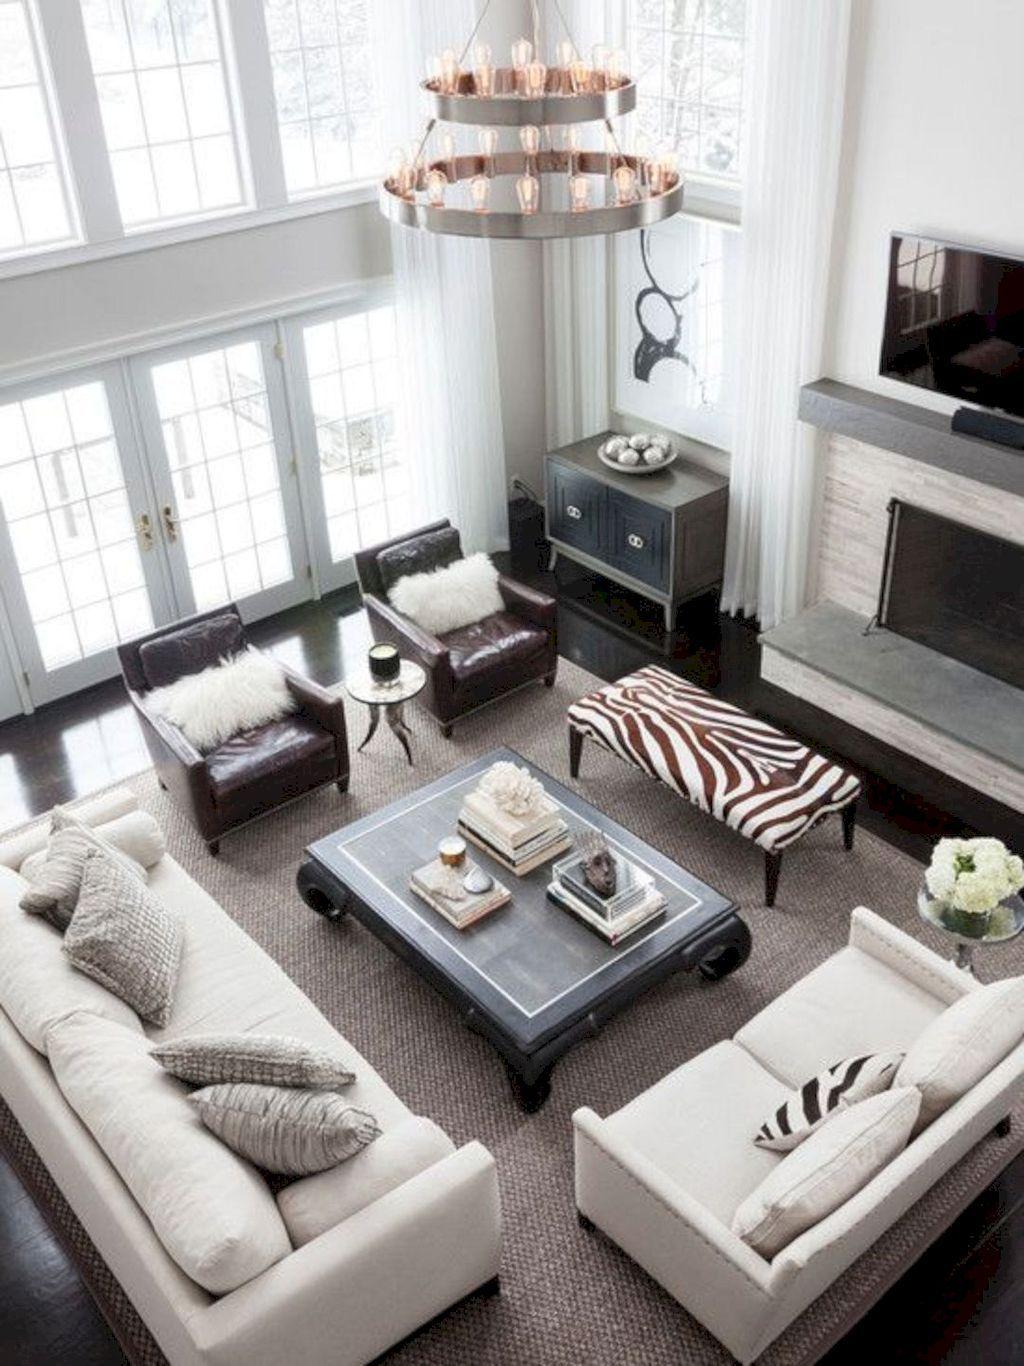 Wonderful Residing Room Furnishings And Furnishings Decor